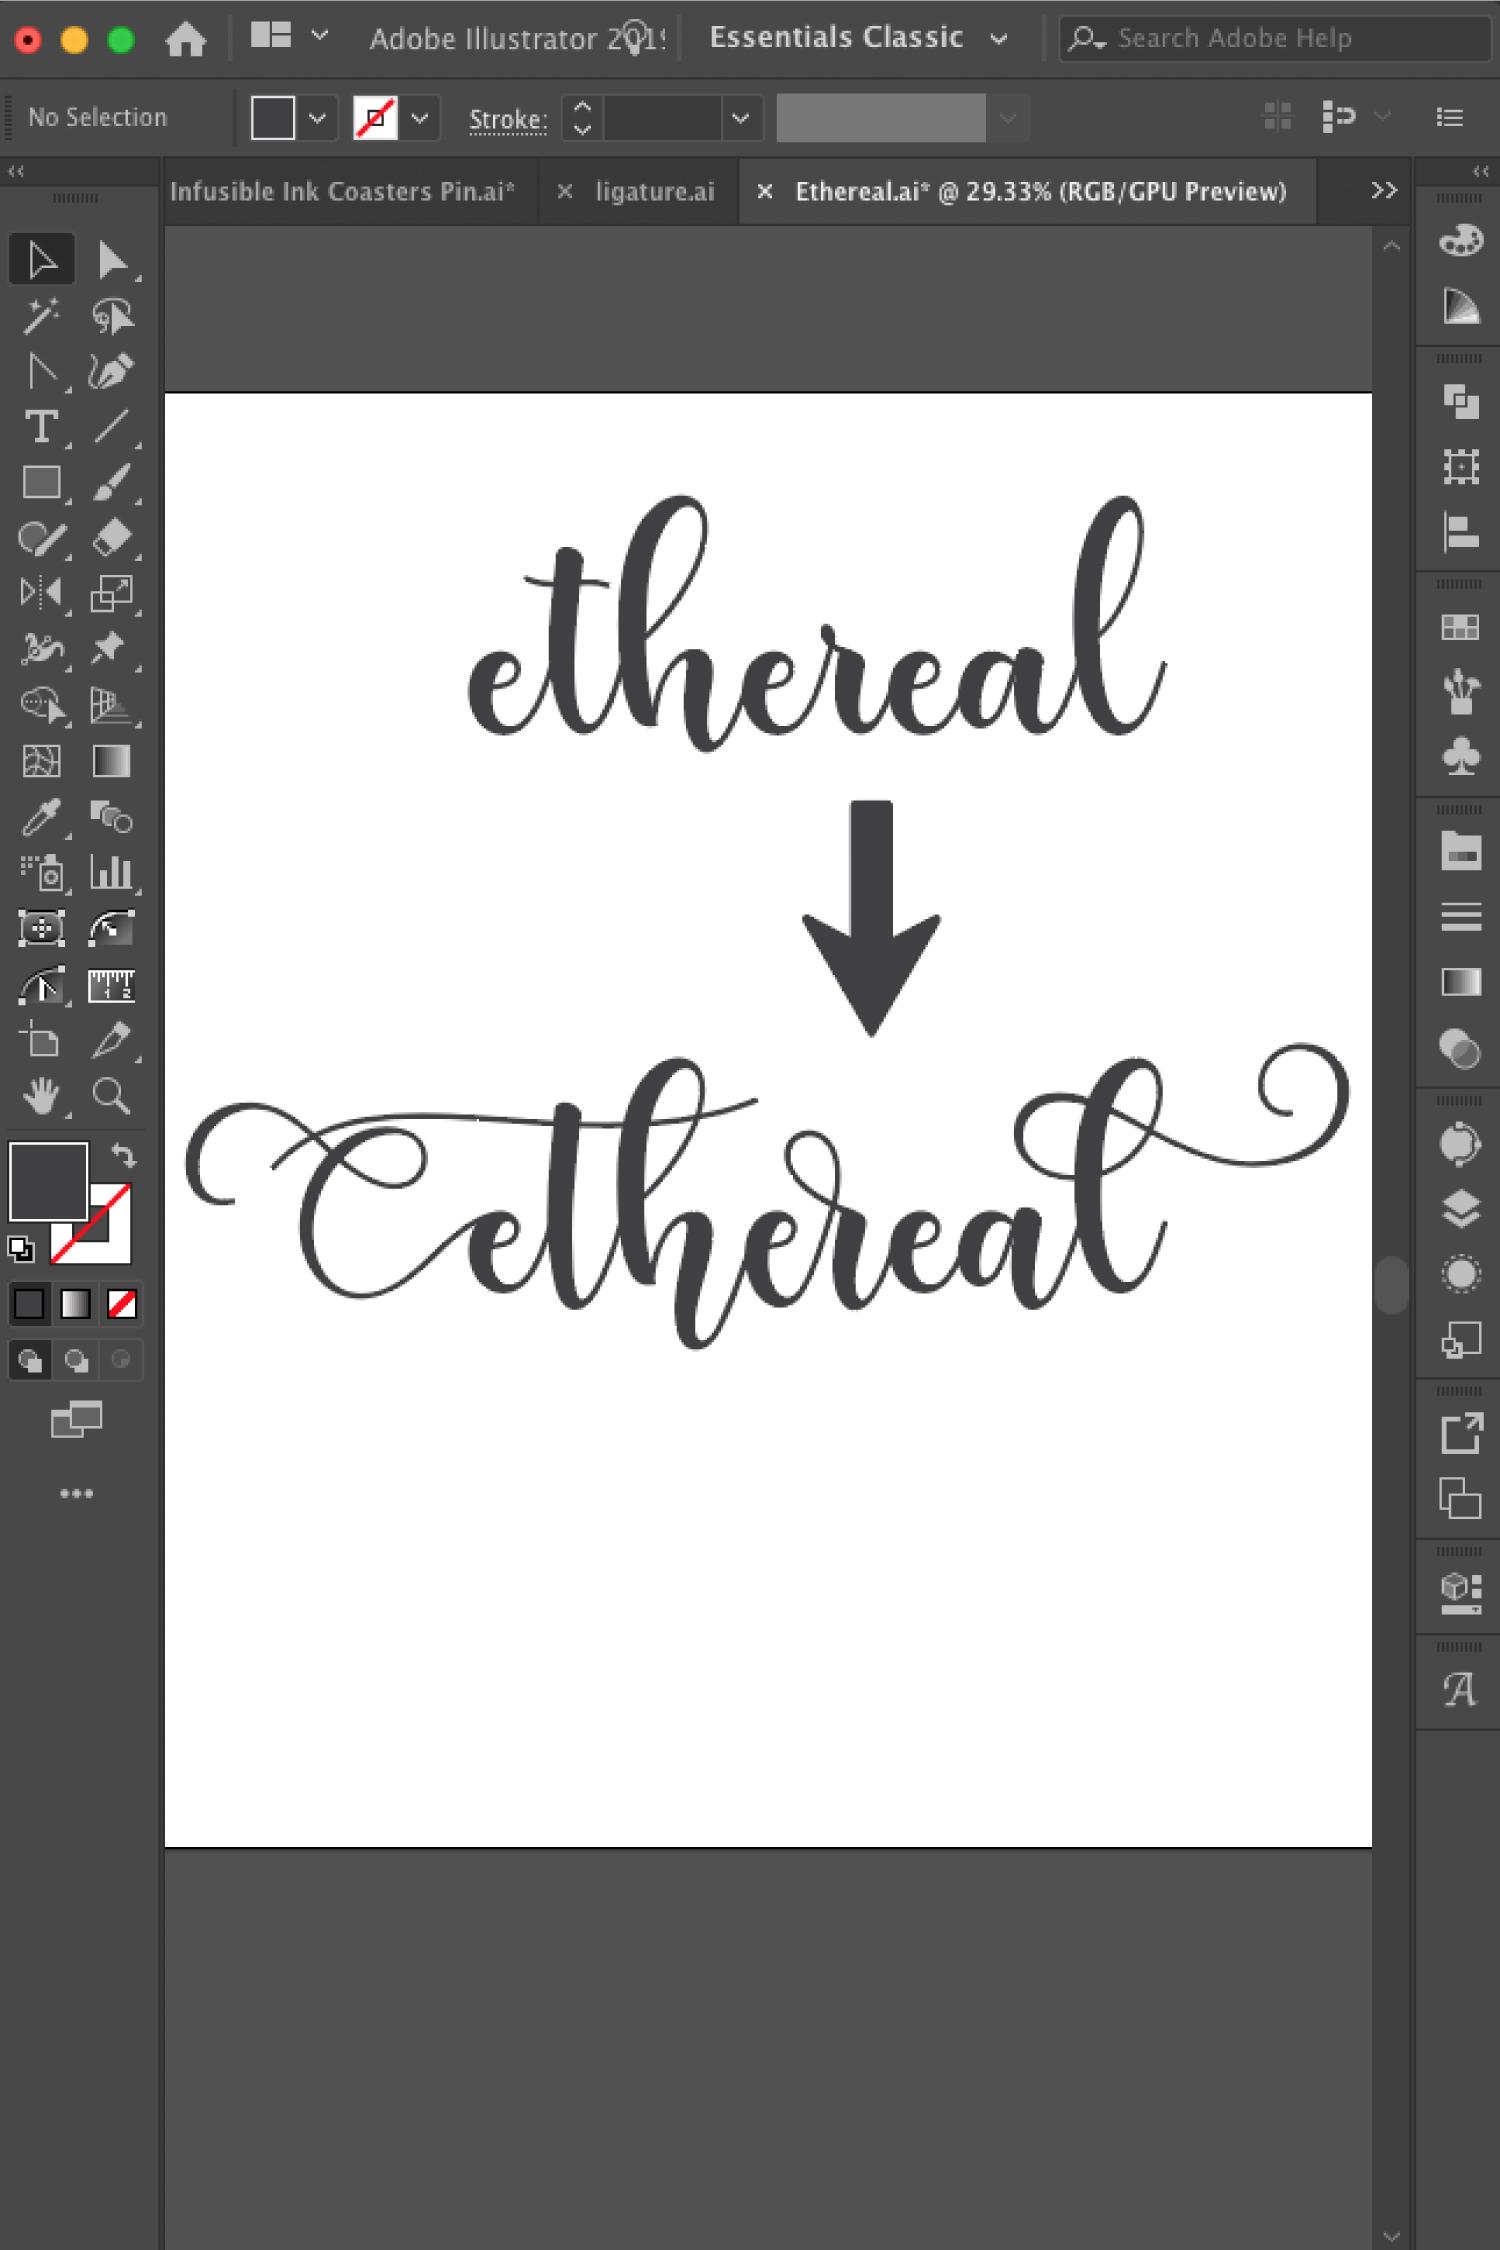 How to Make SVG Files for Cricut Using Illustrator - Hey, Let's Make